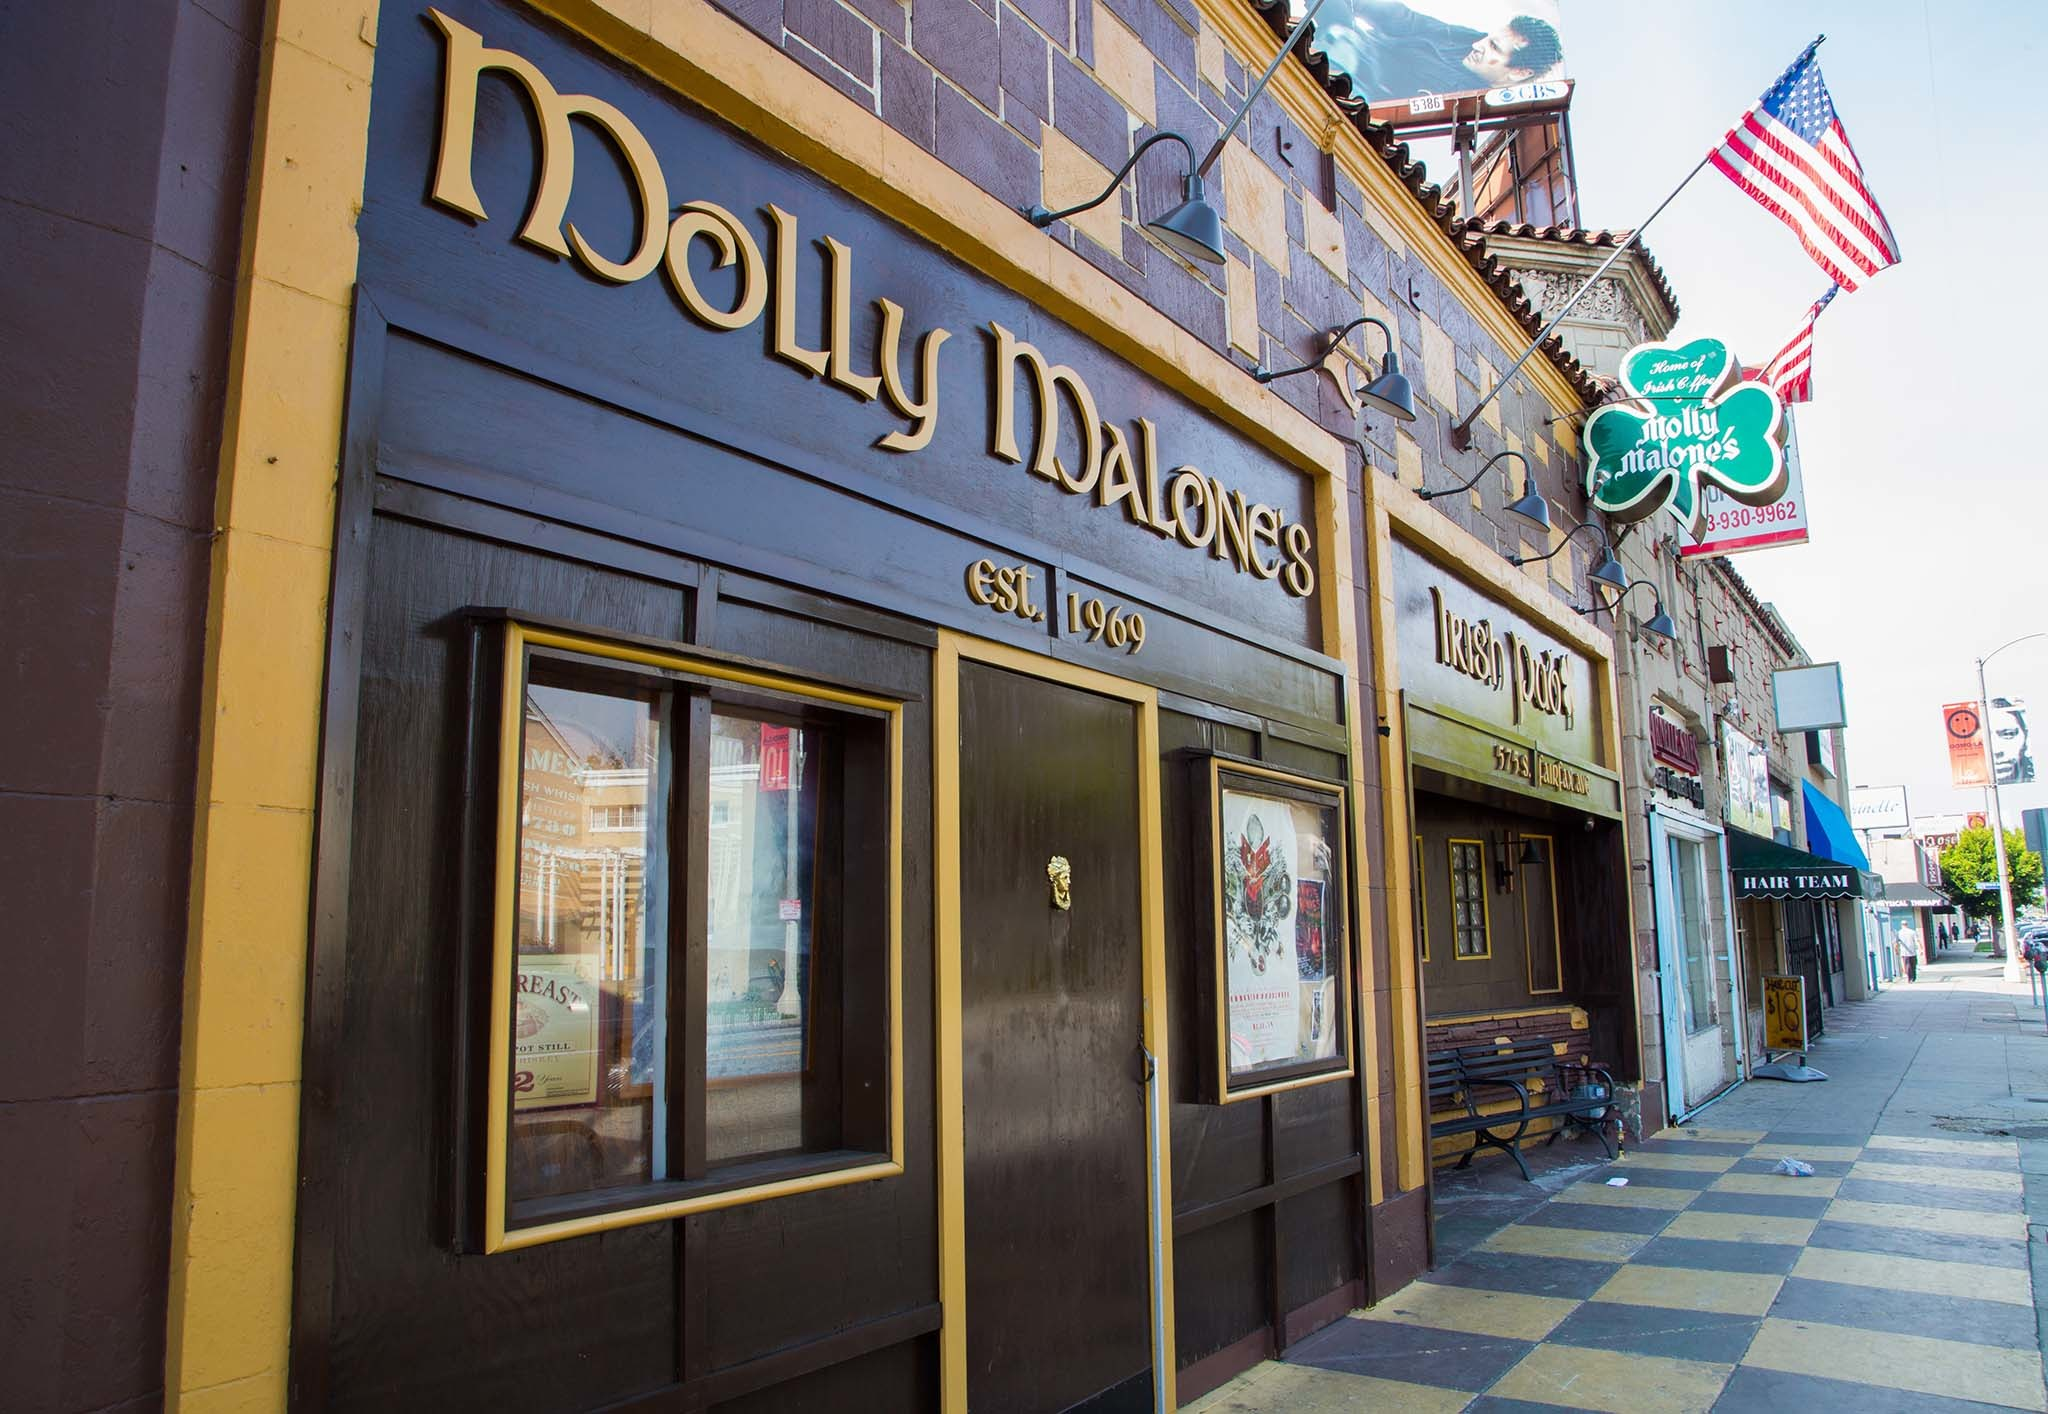 Irish Pubs, Molly Malones, St Patricks Day